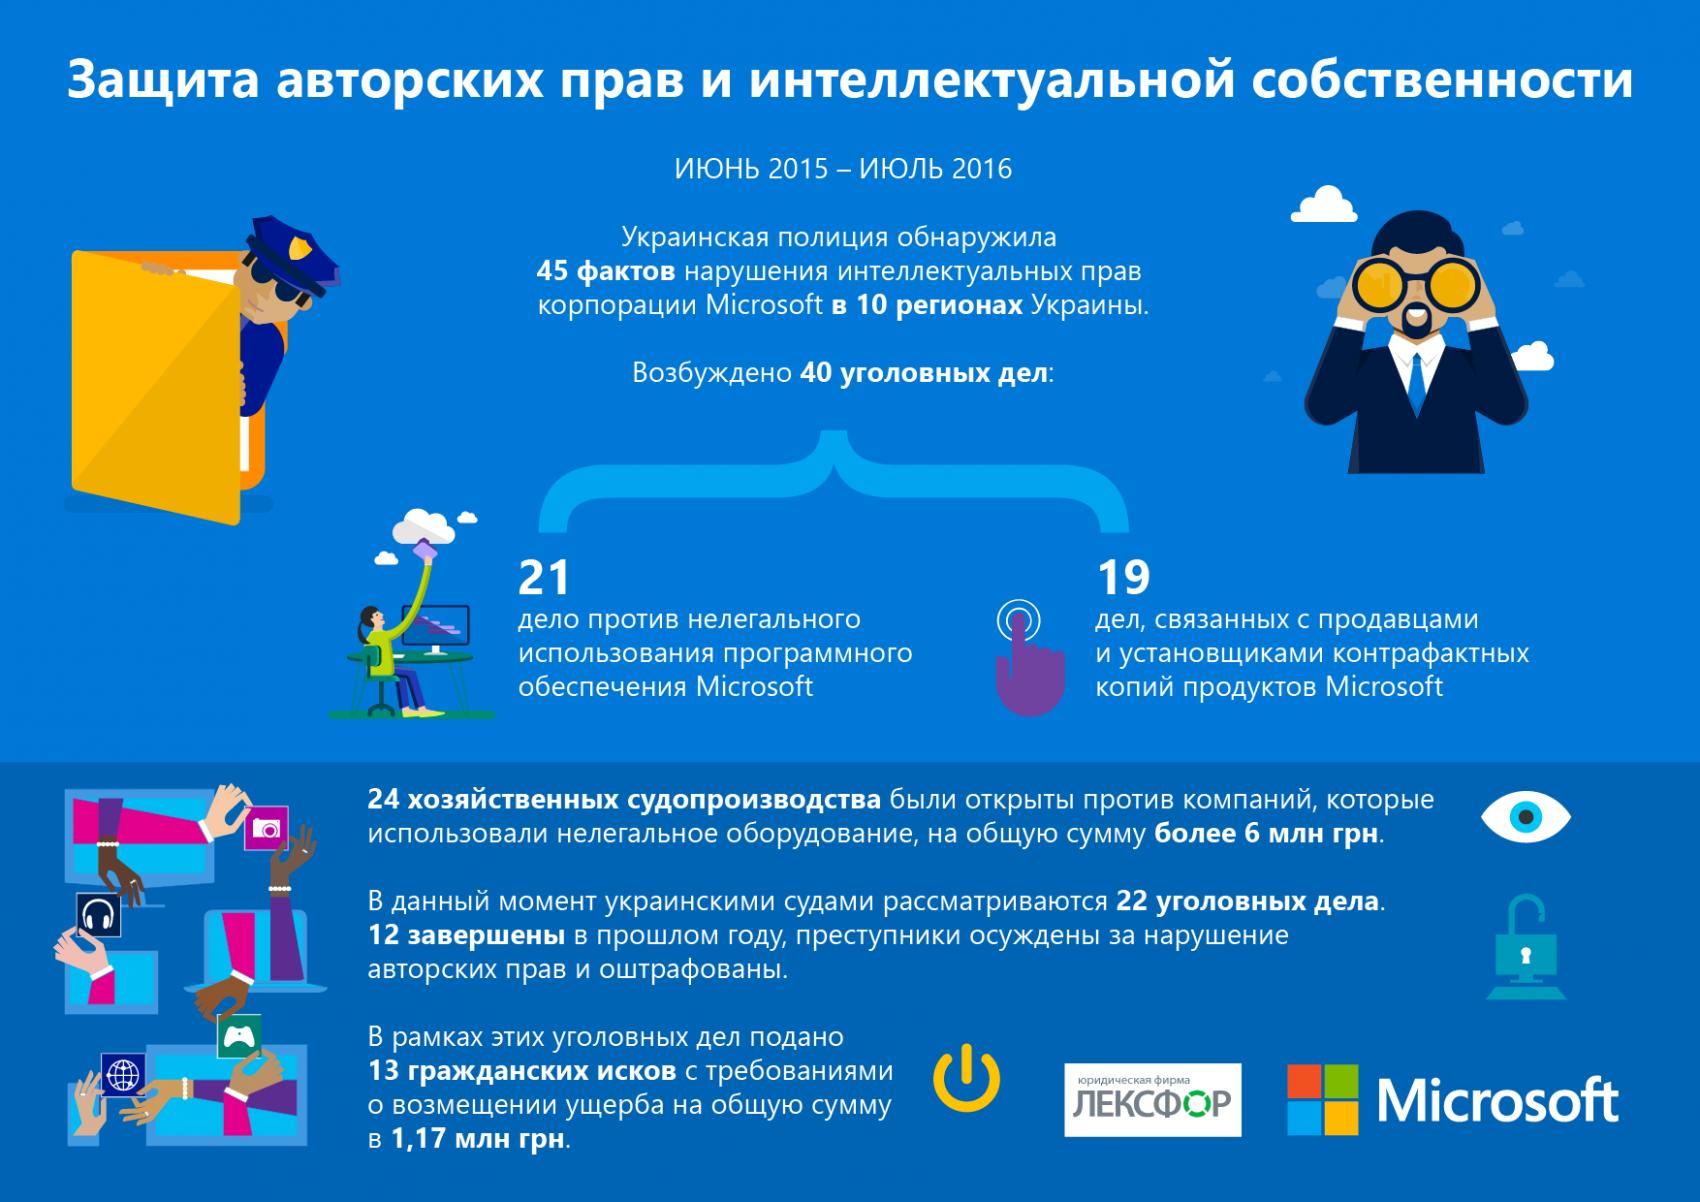 Загод Microsoft подала наукраинских пиратов исков на6 млн грн